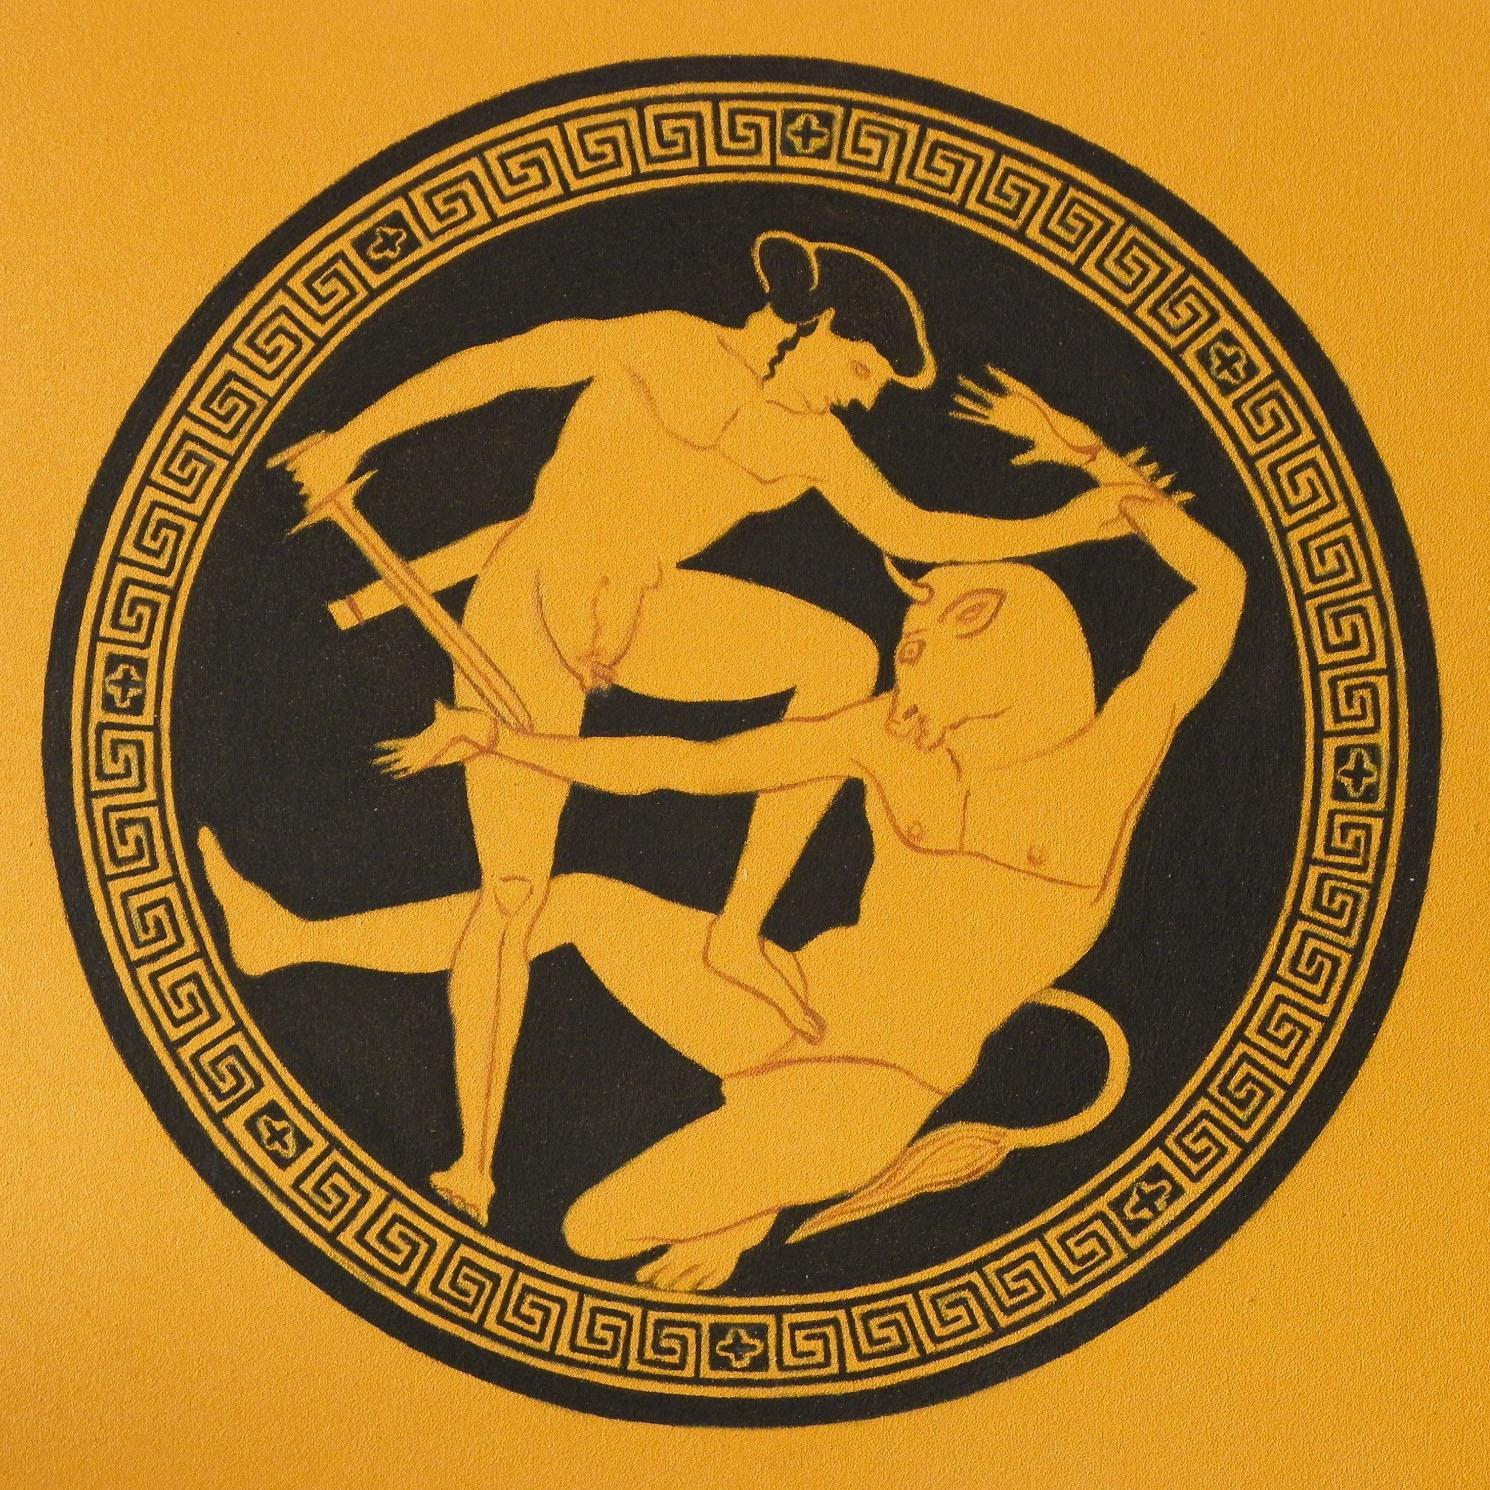 2011 roberta rossi - teseo lotta col minotauro - olio su tavola - 25 x 25